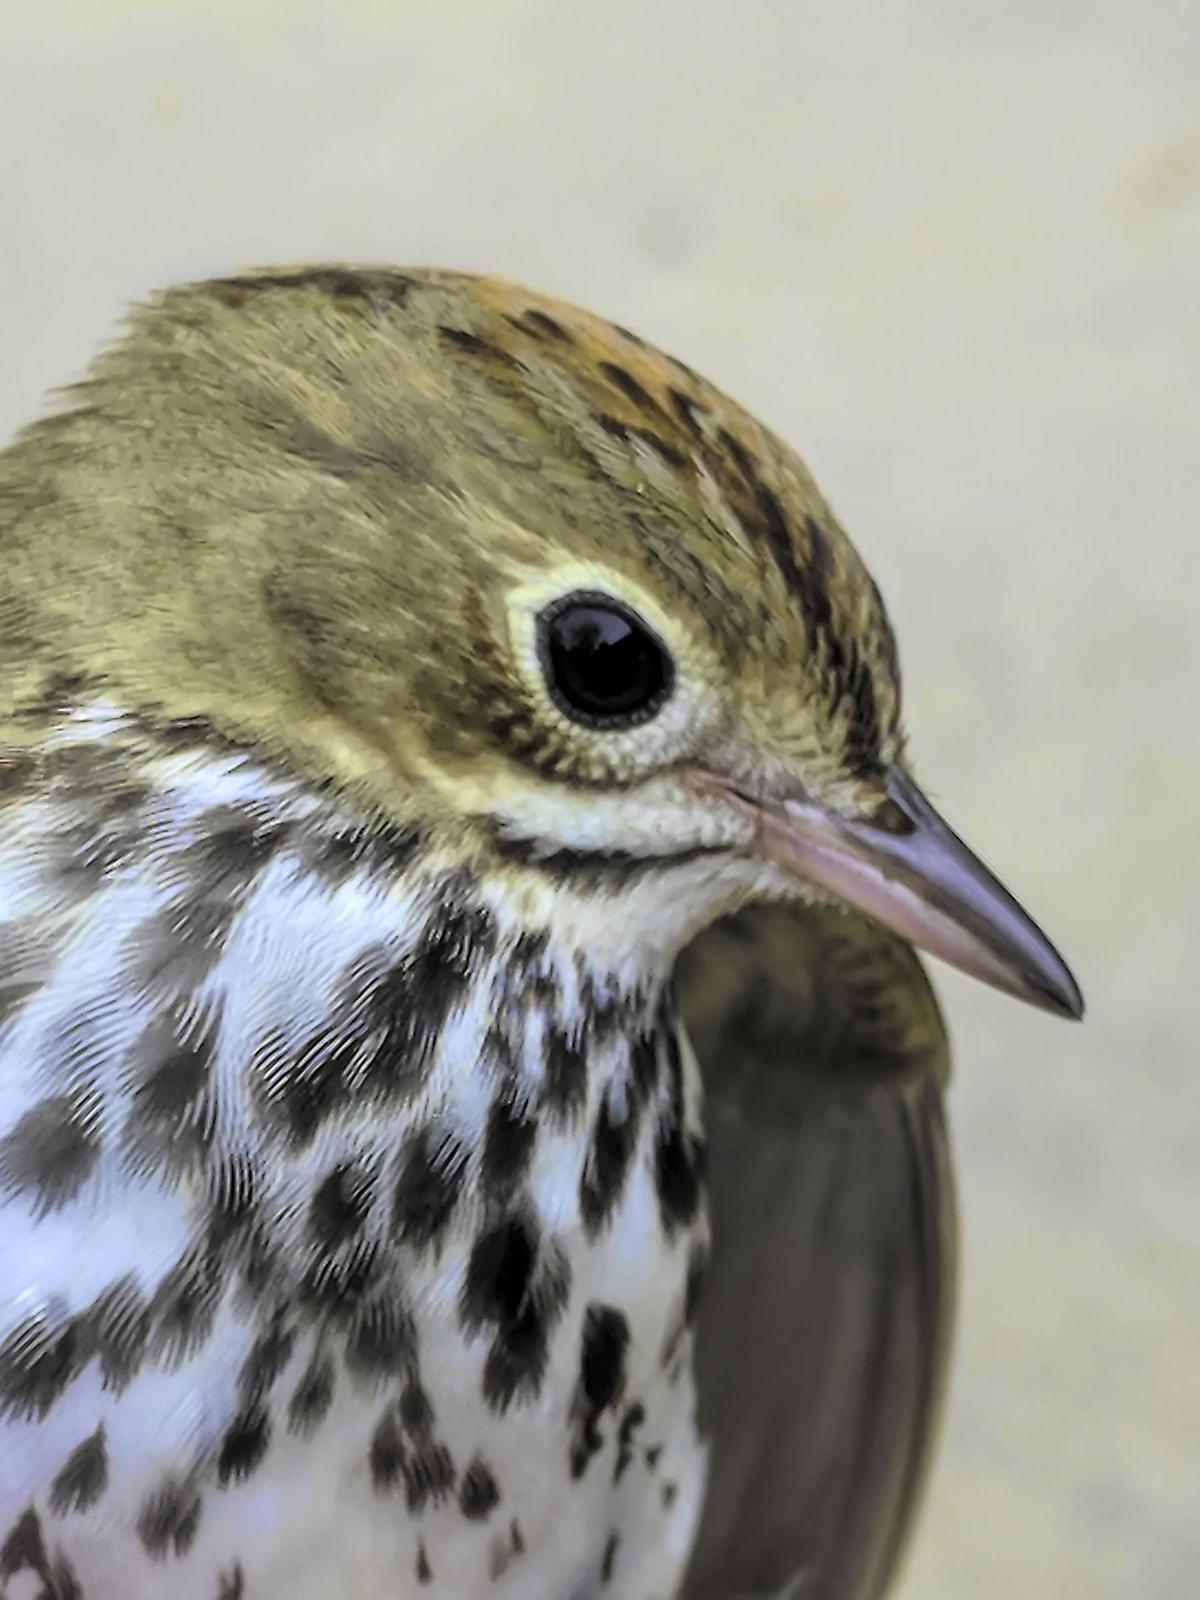 Ovenbird Photo by Dan Tallman